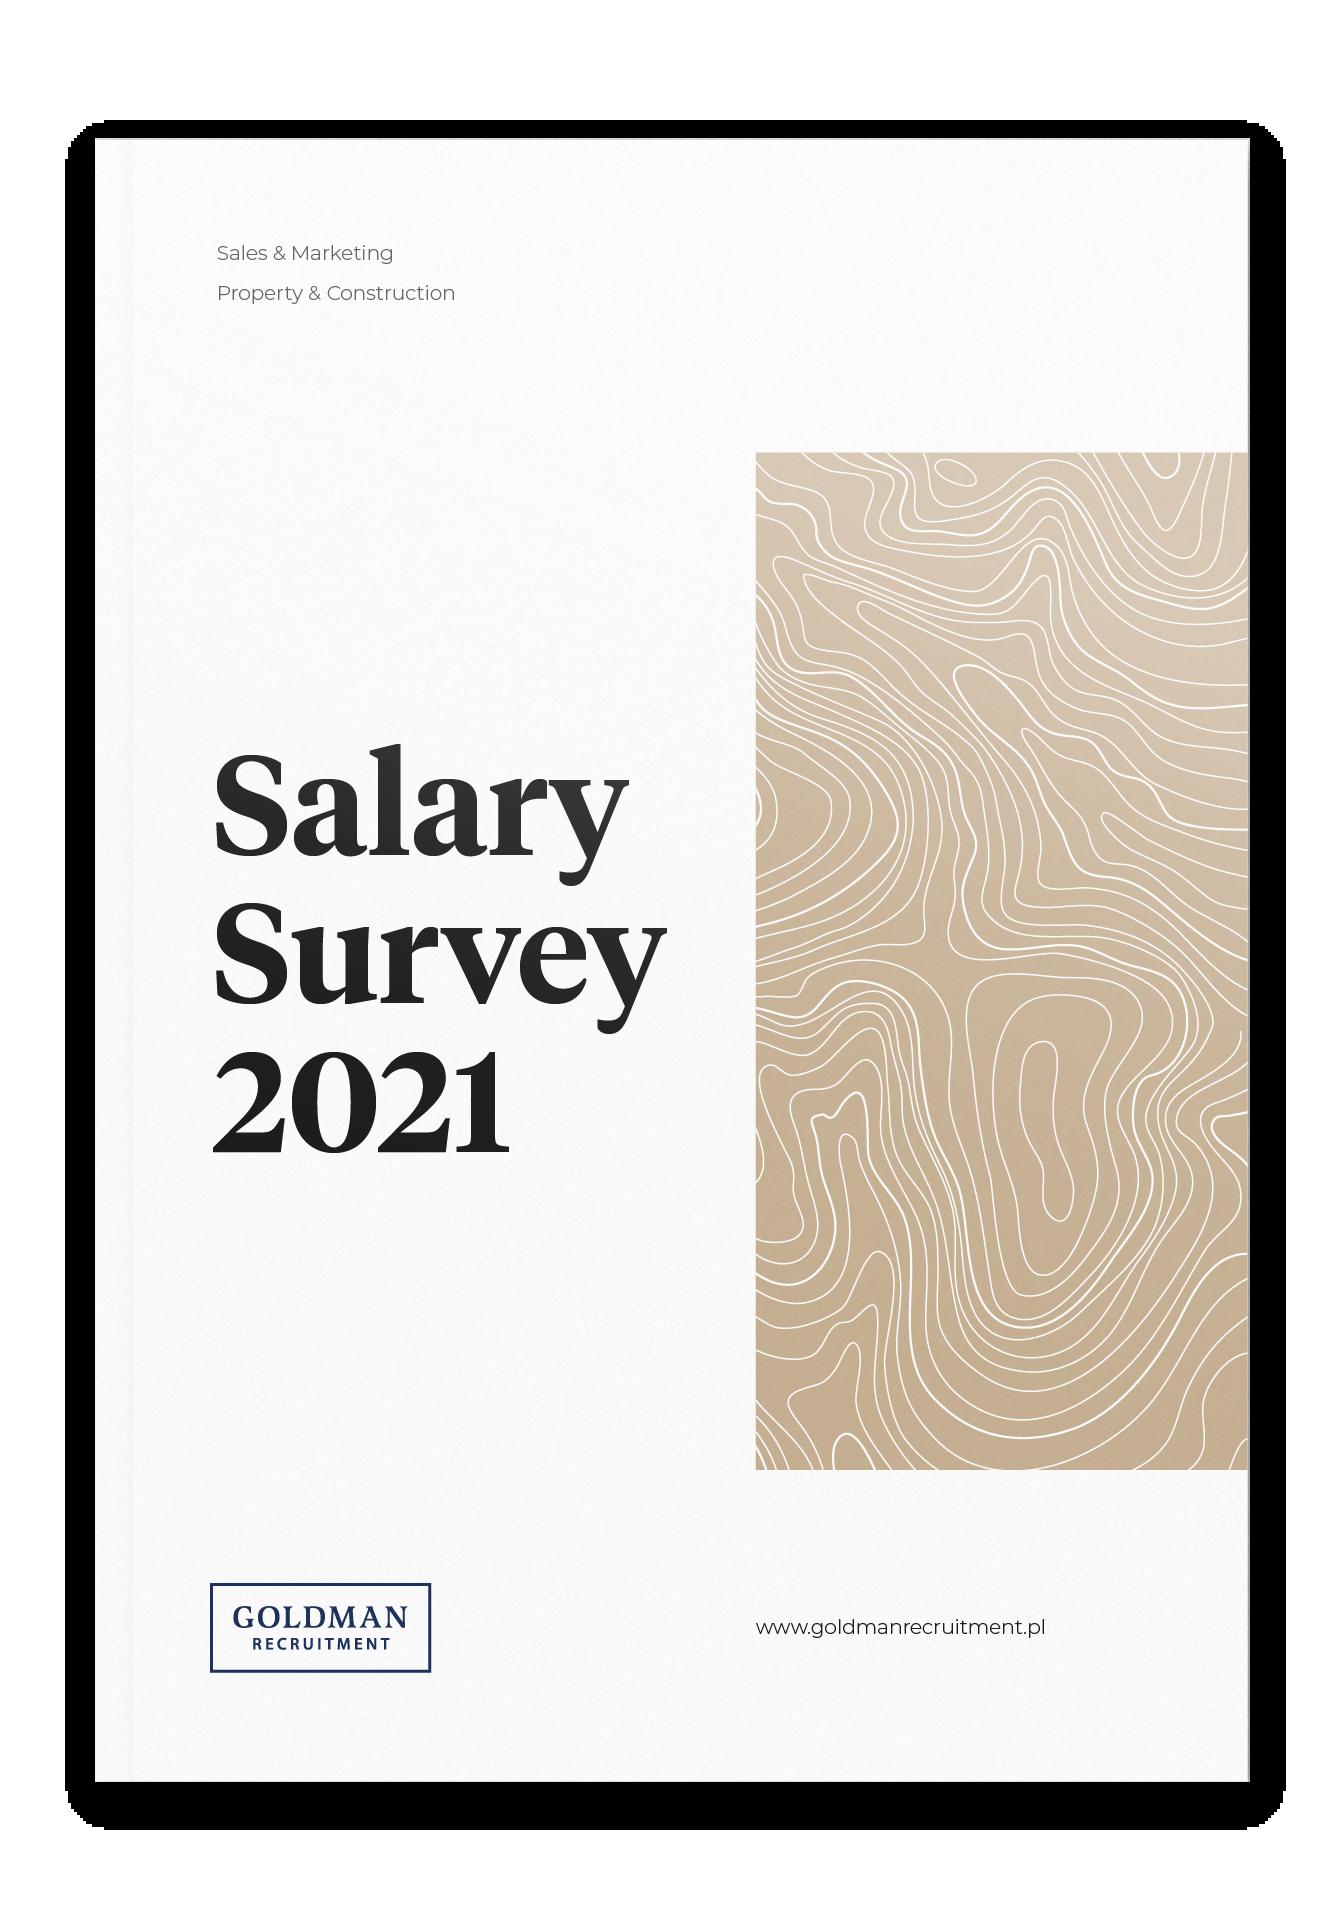 Sales & Marketing Salary Survey 2021